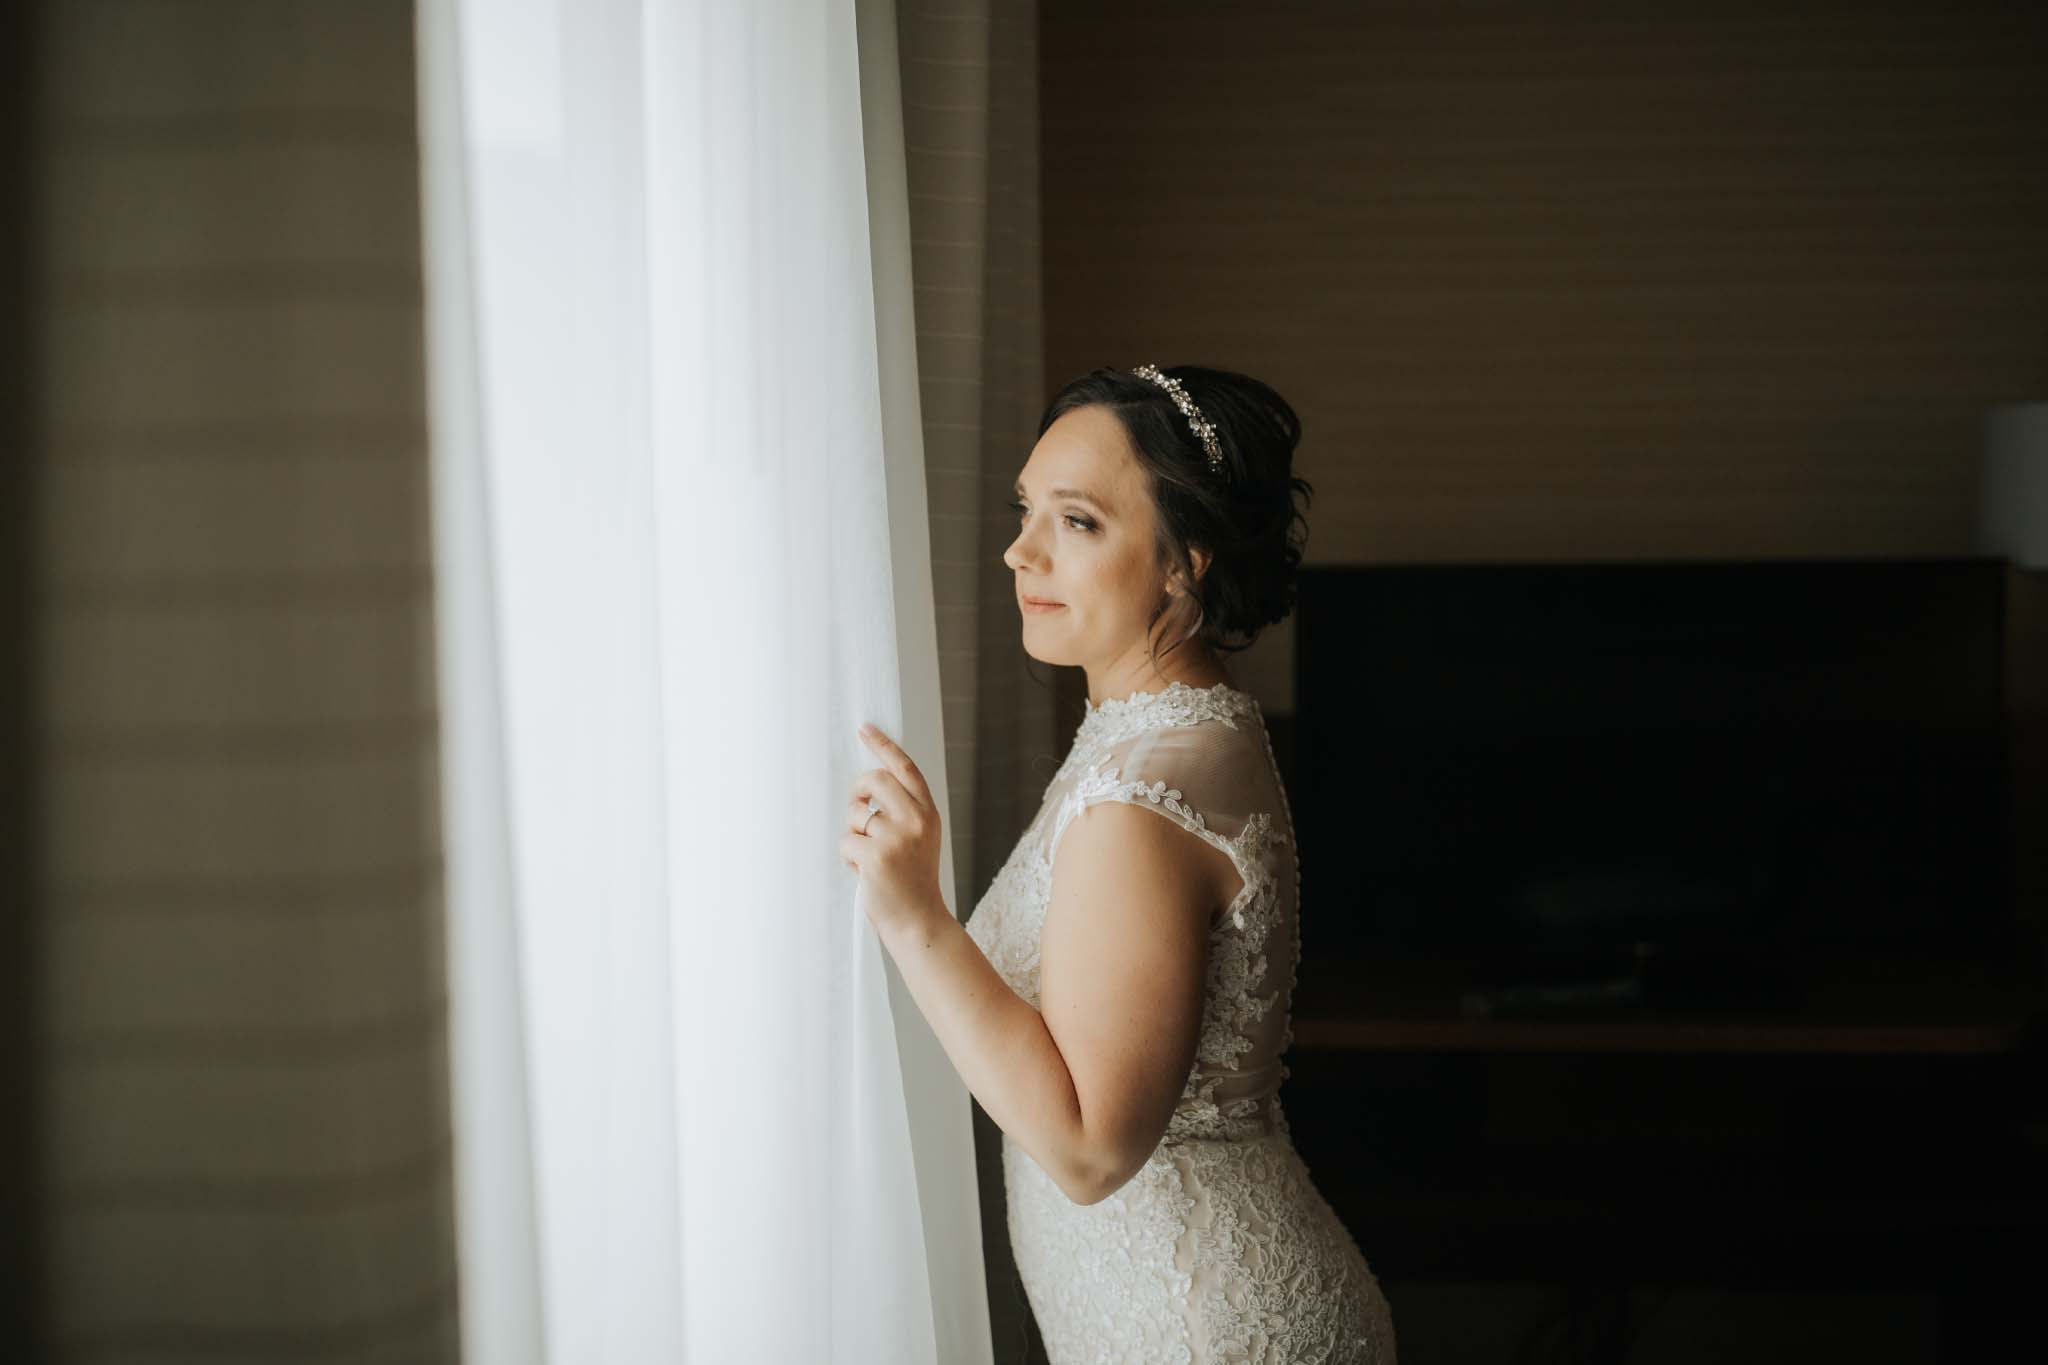 Wegerzyn Gardens, Photo session, Wedding, Outdoor, Bride and Groom, Dayton, Ohio, Photography, Photographer, Double tree, Hilton, Hotel, Getting ready